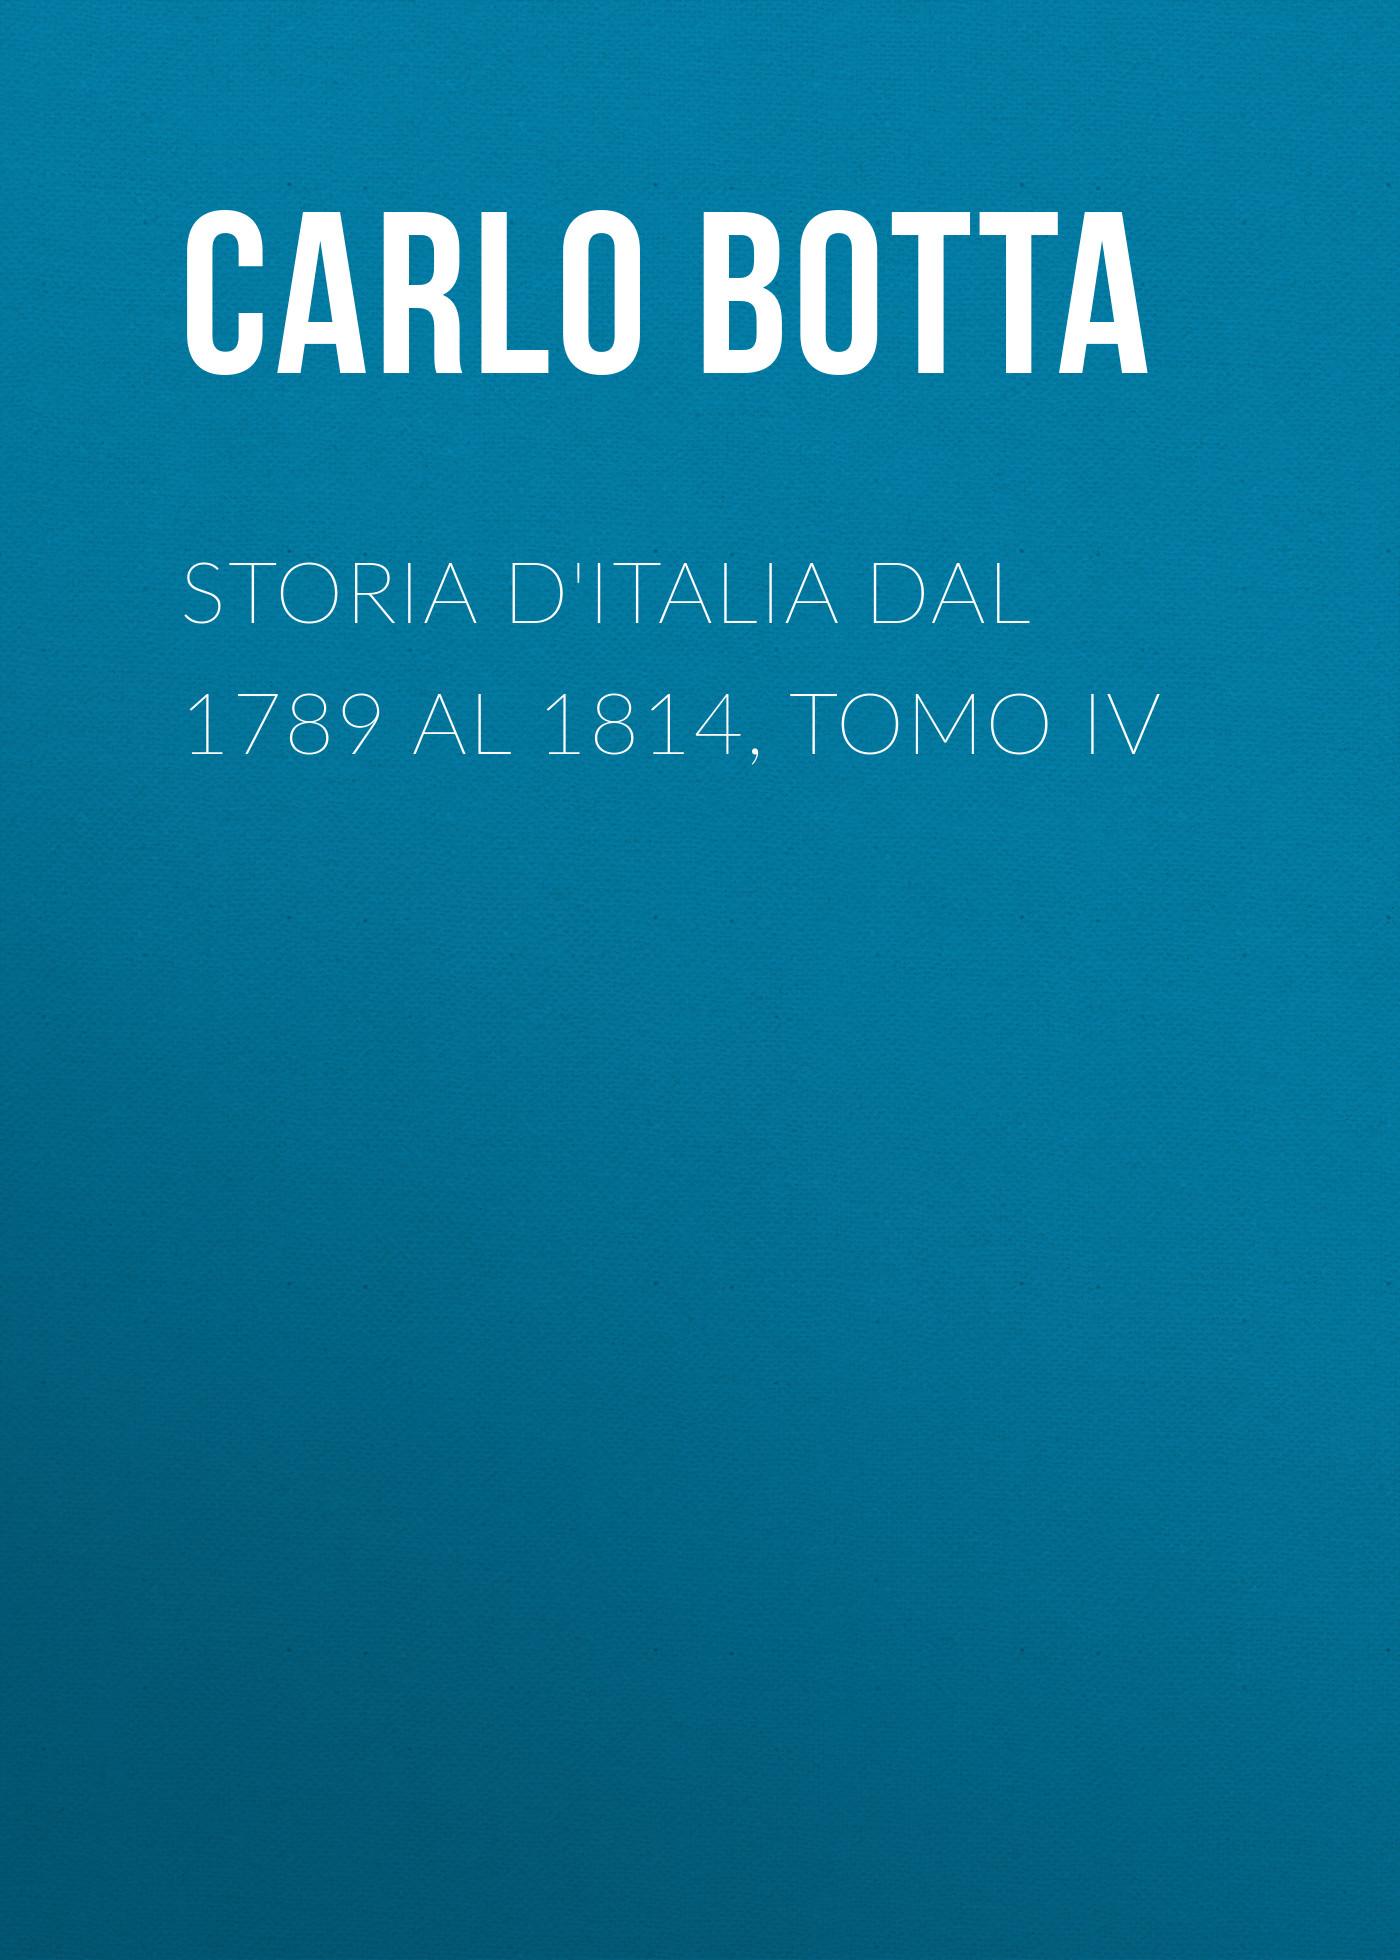 Botta Carlo Storia d'Italia dal 1789 al 1814, tomo IV balmes jaime luciano filosofía fundamental tomo iv